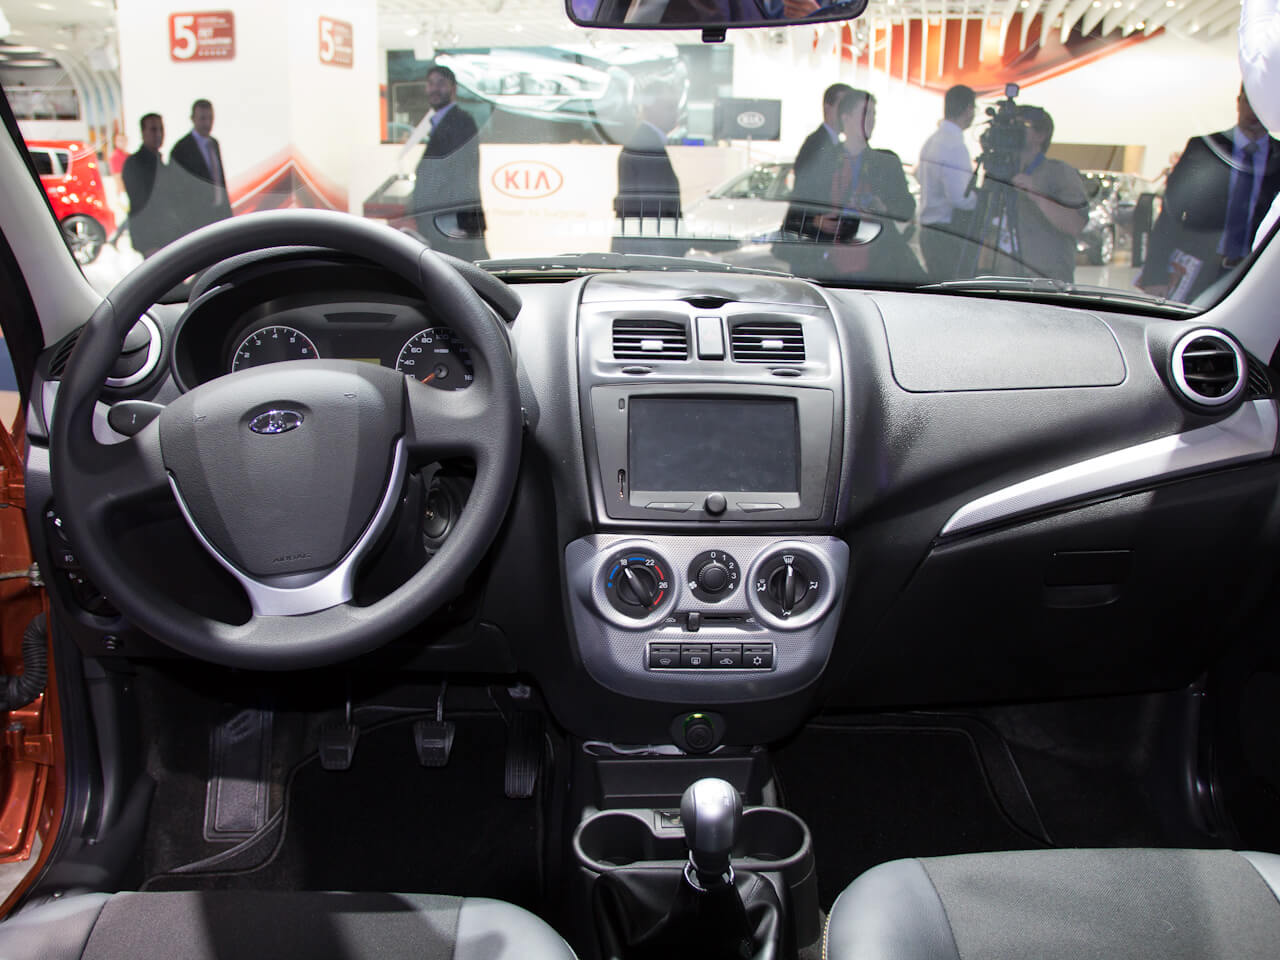 Центральная консоль автомобиля Лада Калина-2